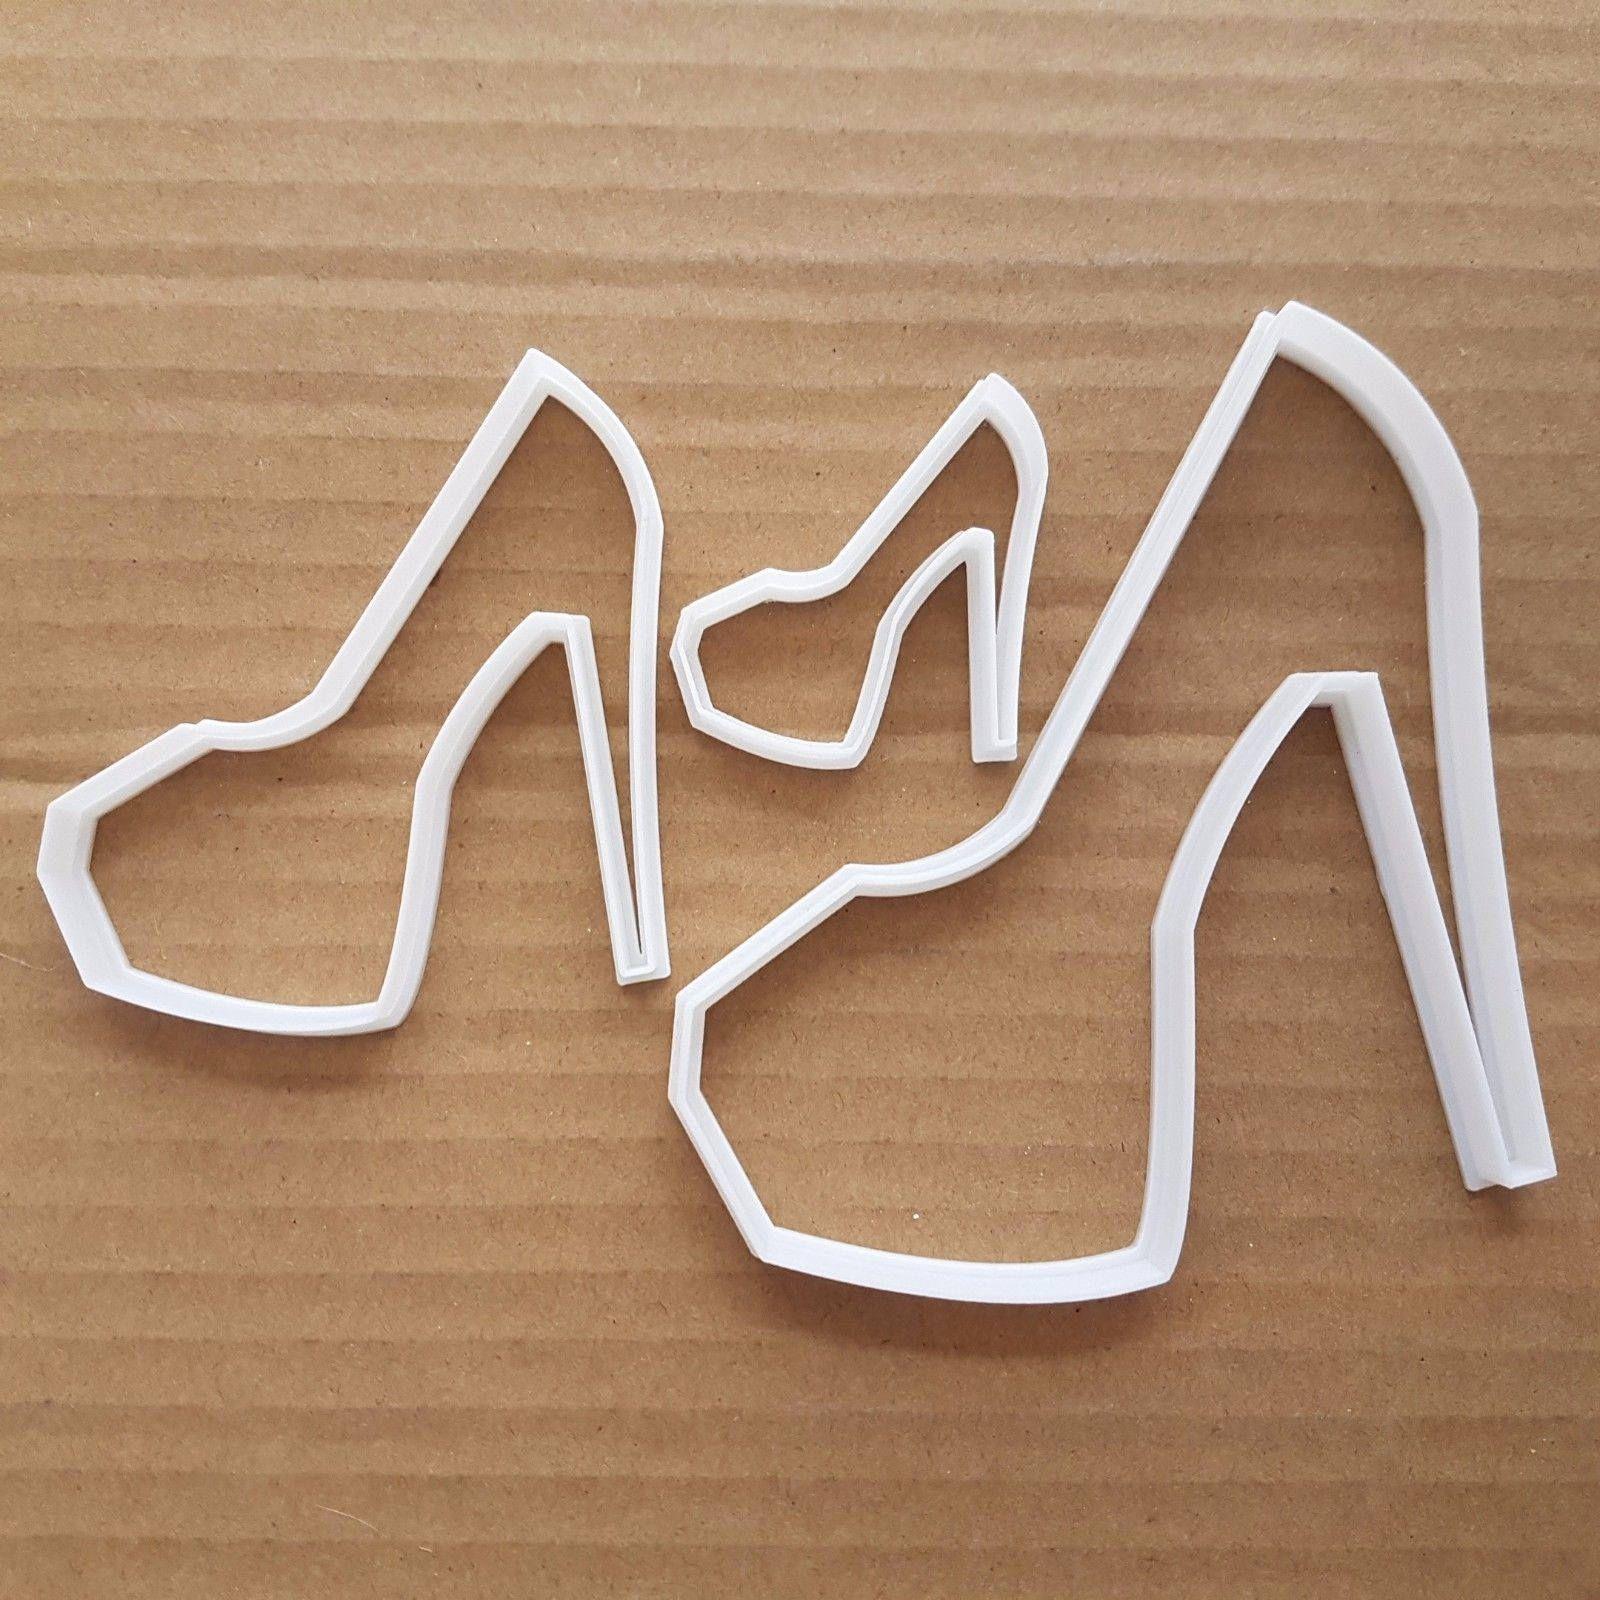 High Heel Shoe Shaped Cookie Cutter